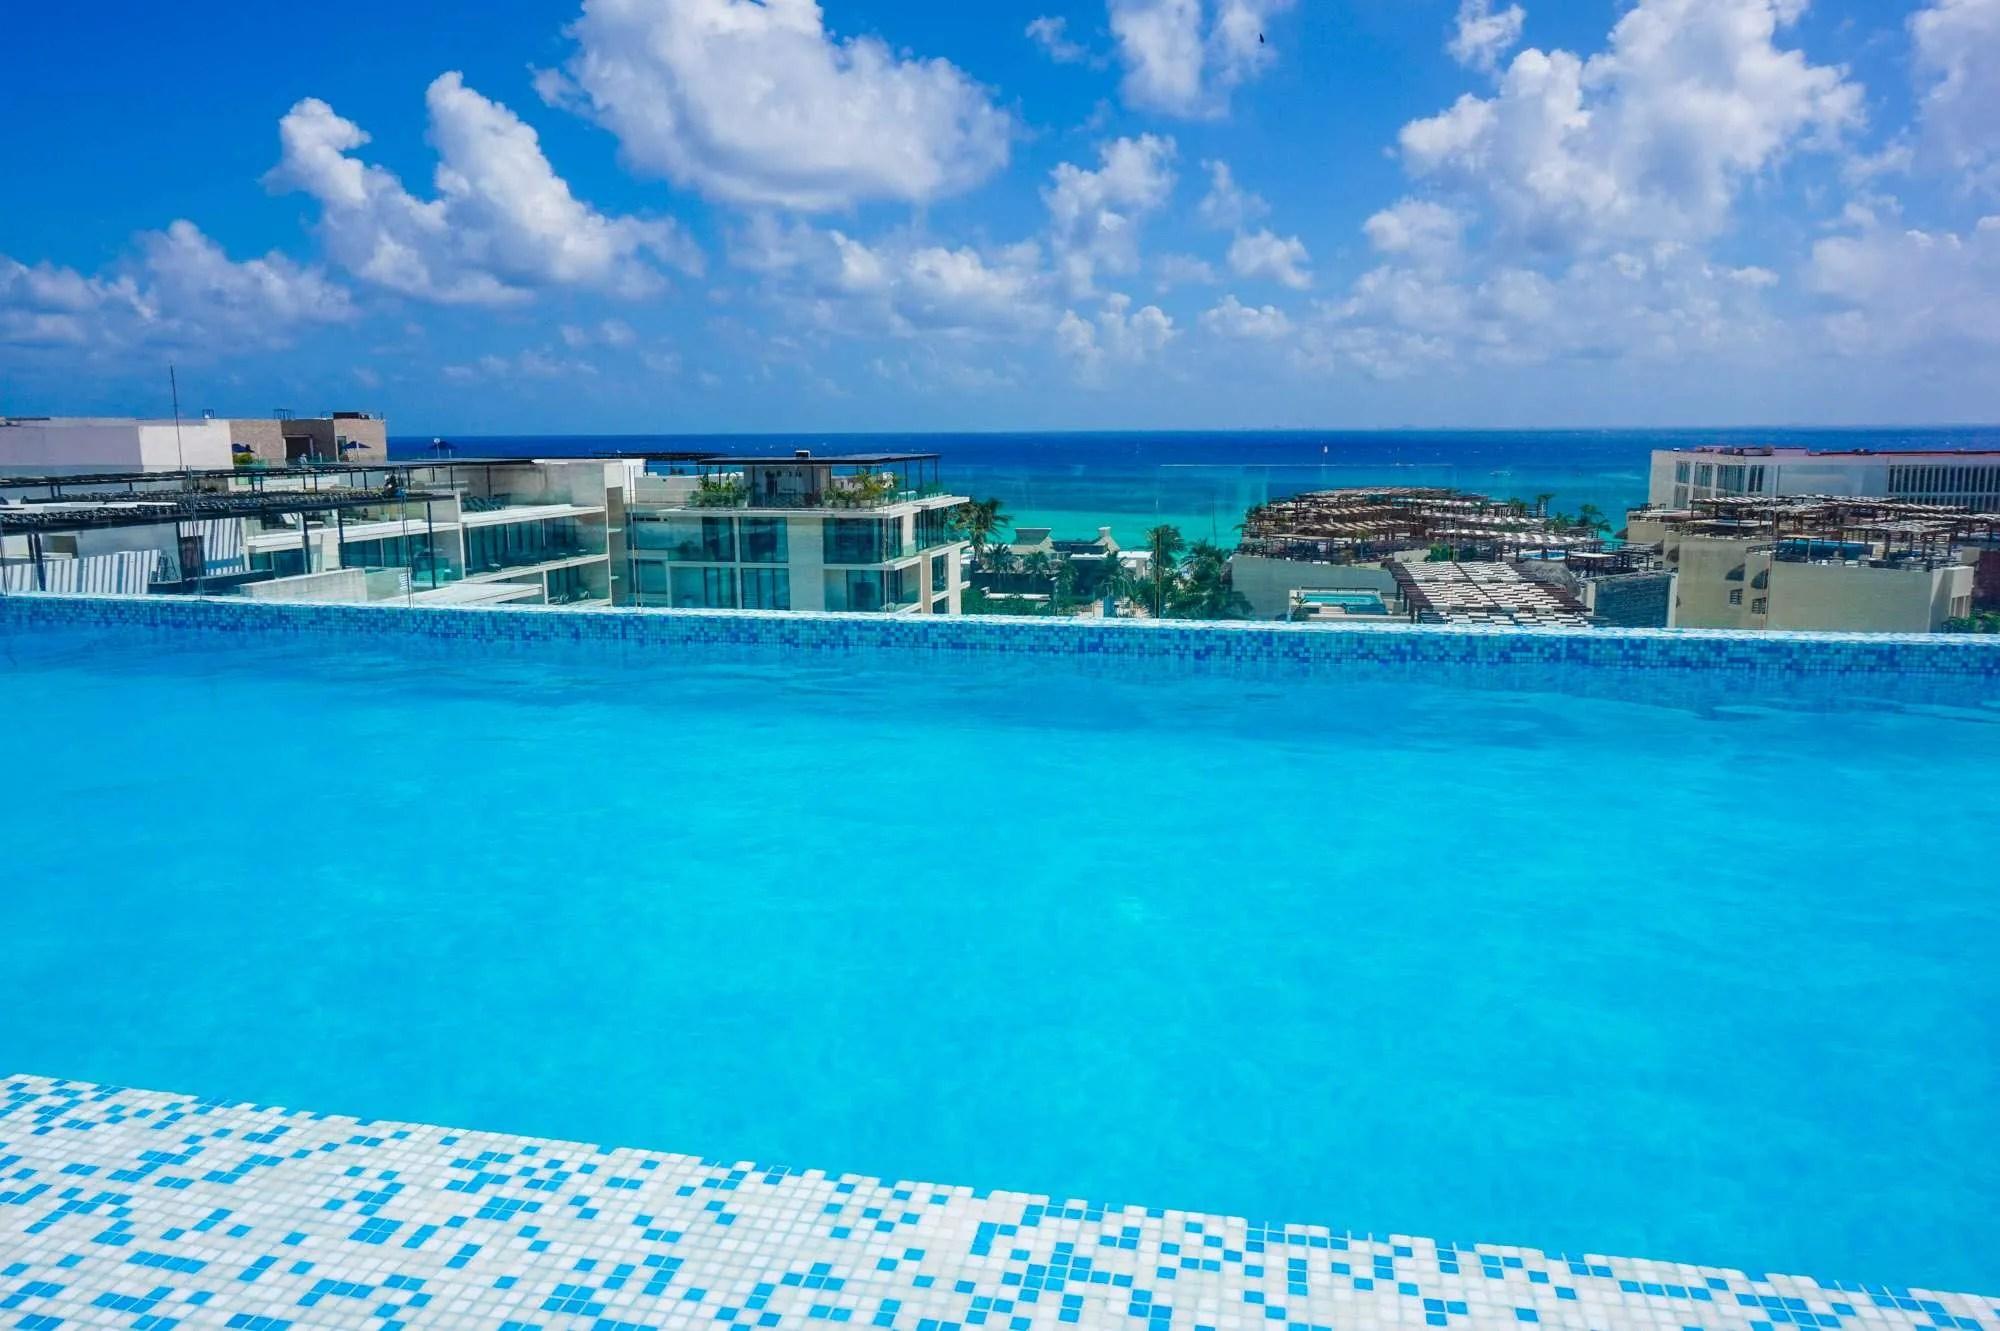 The Best Rooftop Pools in Playa del Carmen to Visit in 2021